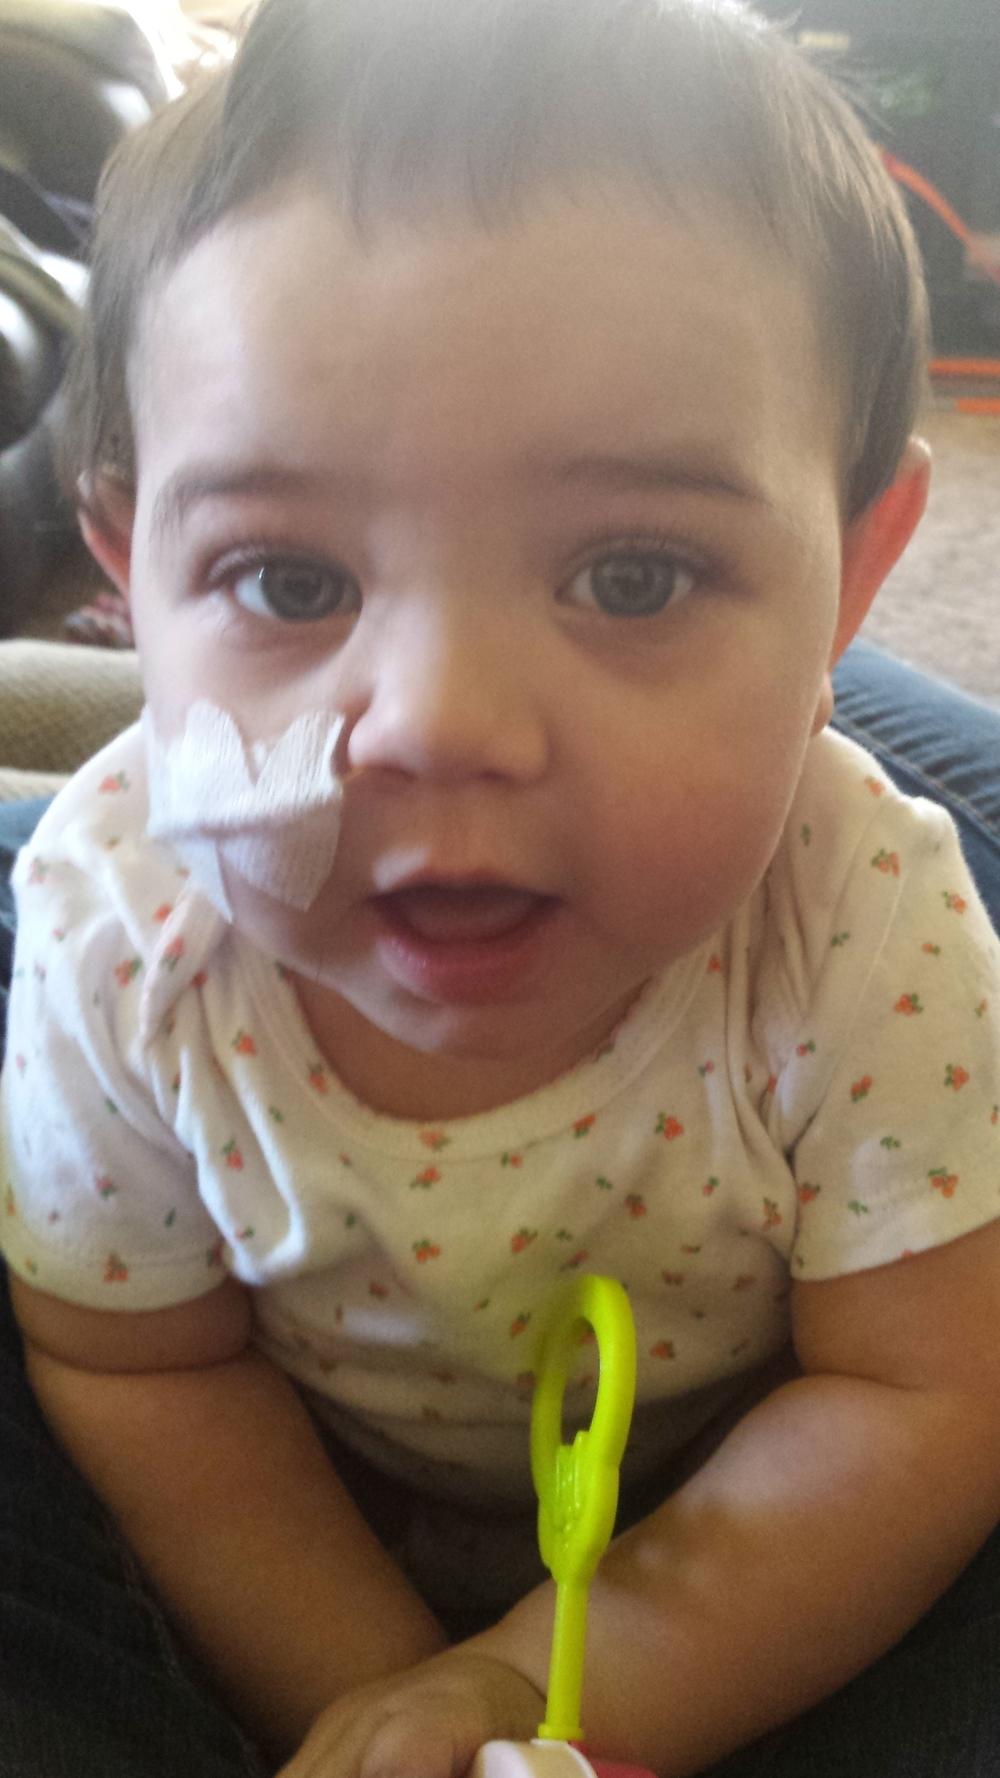 Melina, 15 months